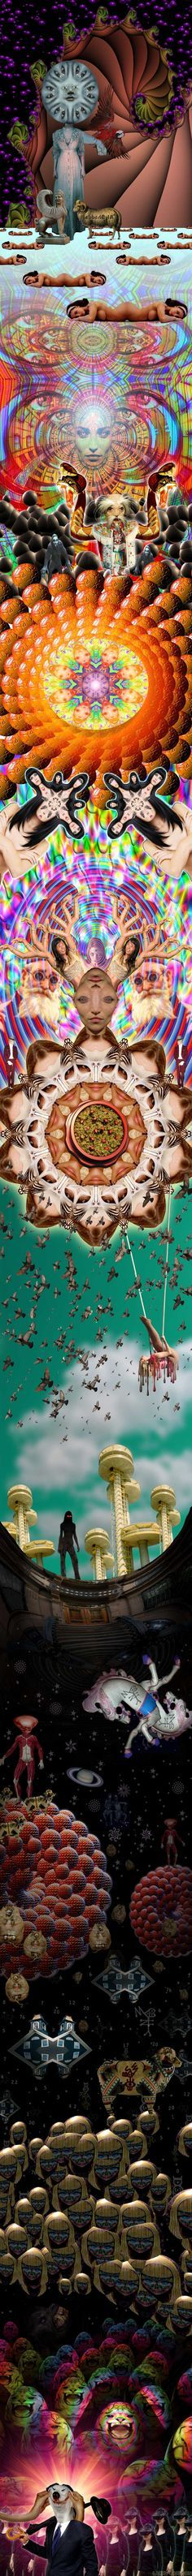 WEIRD WORLDS SCROLLS ___by LARRY CARLSON 2008.